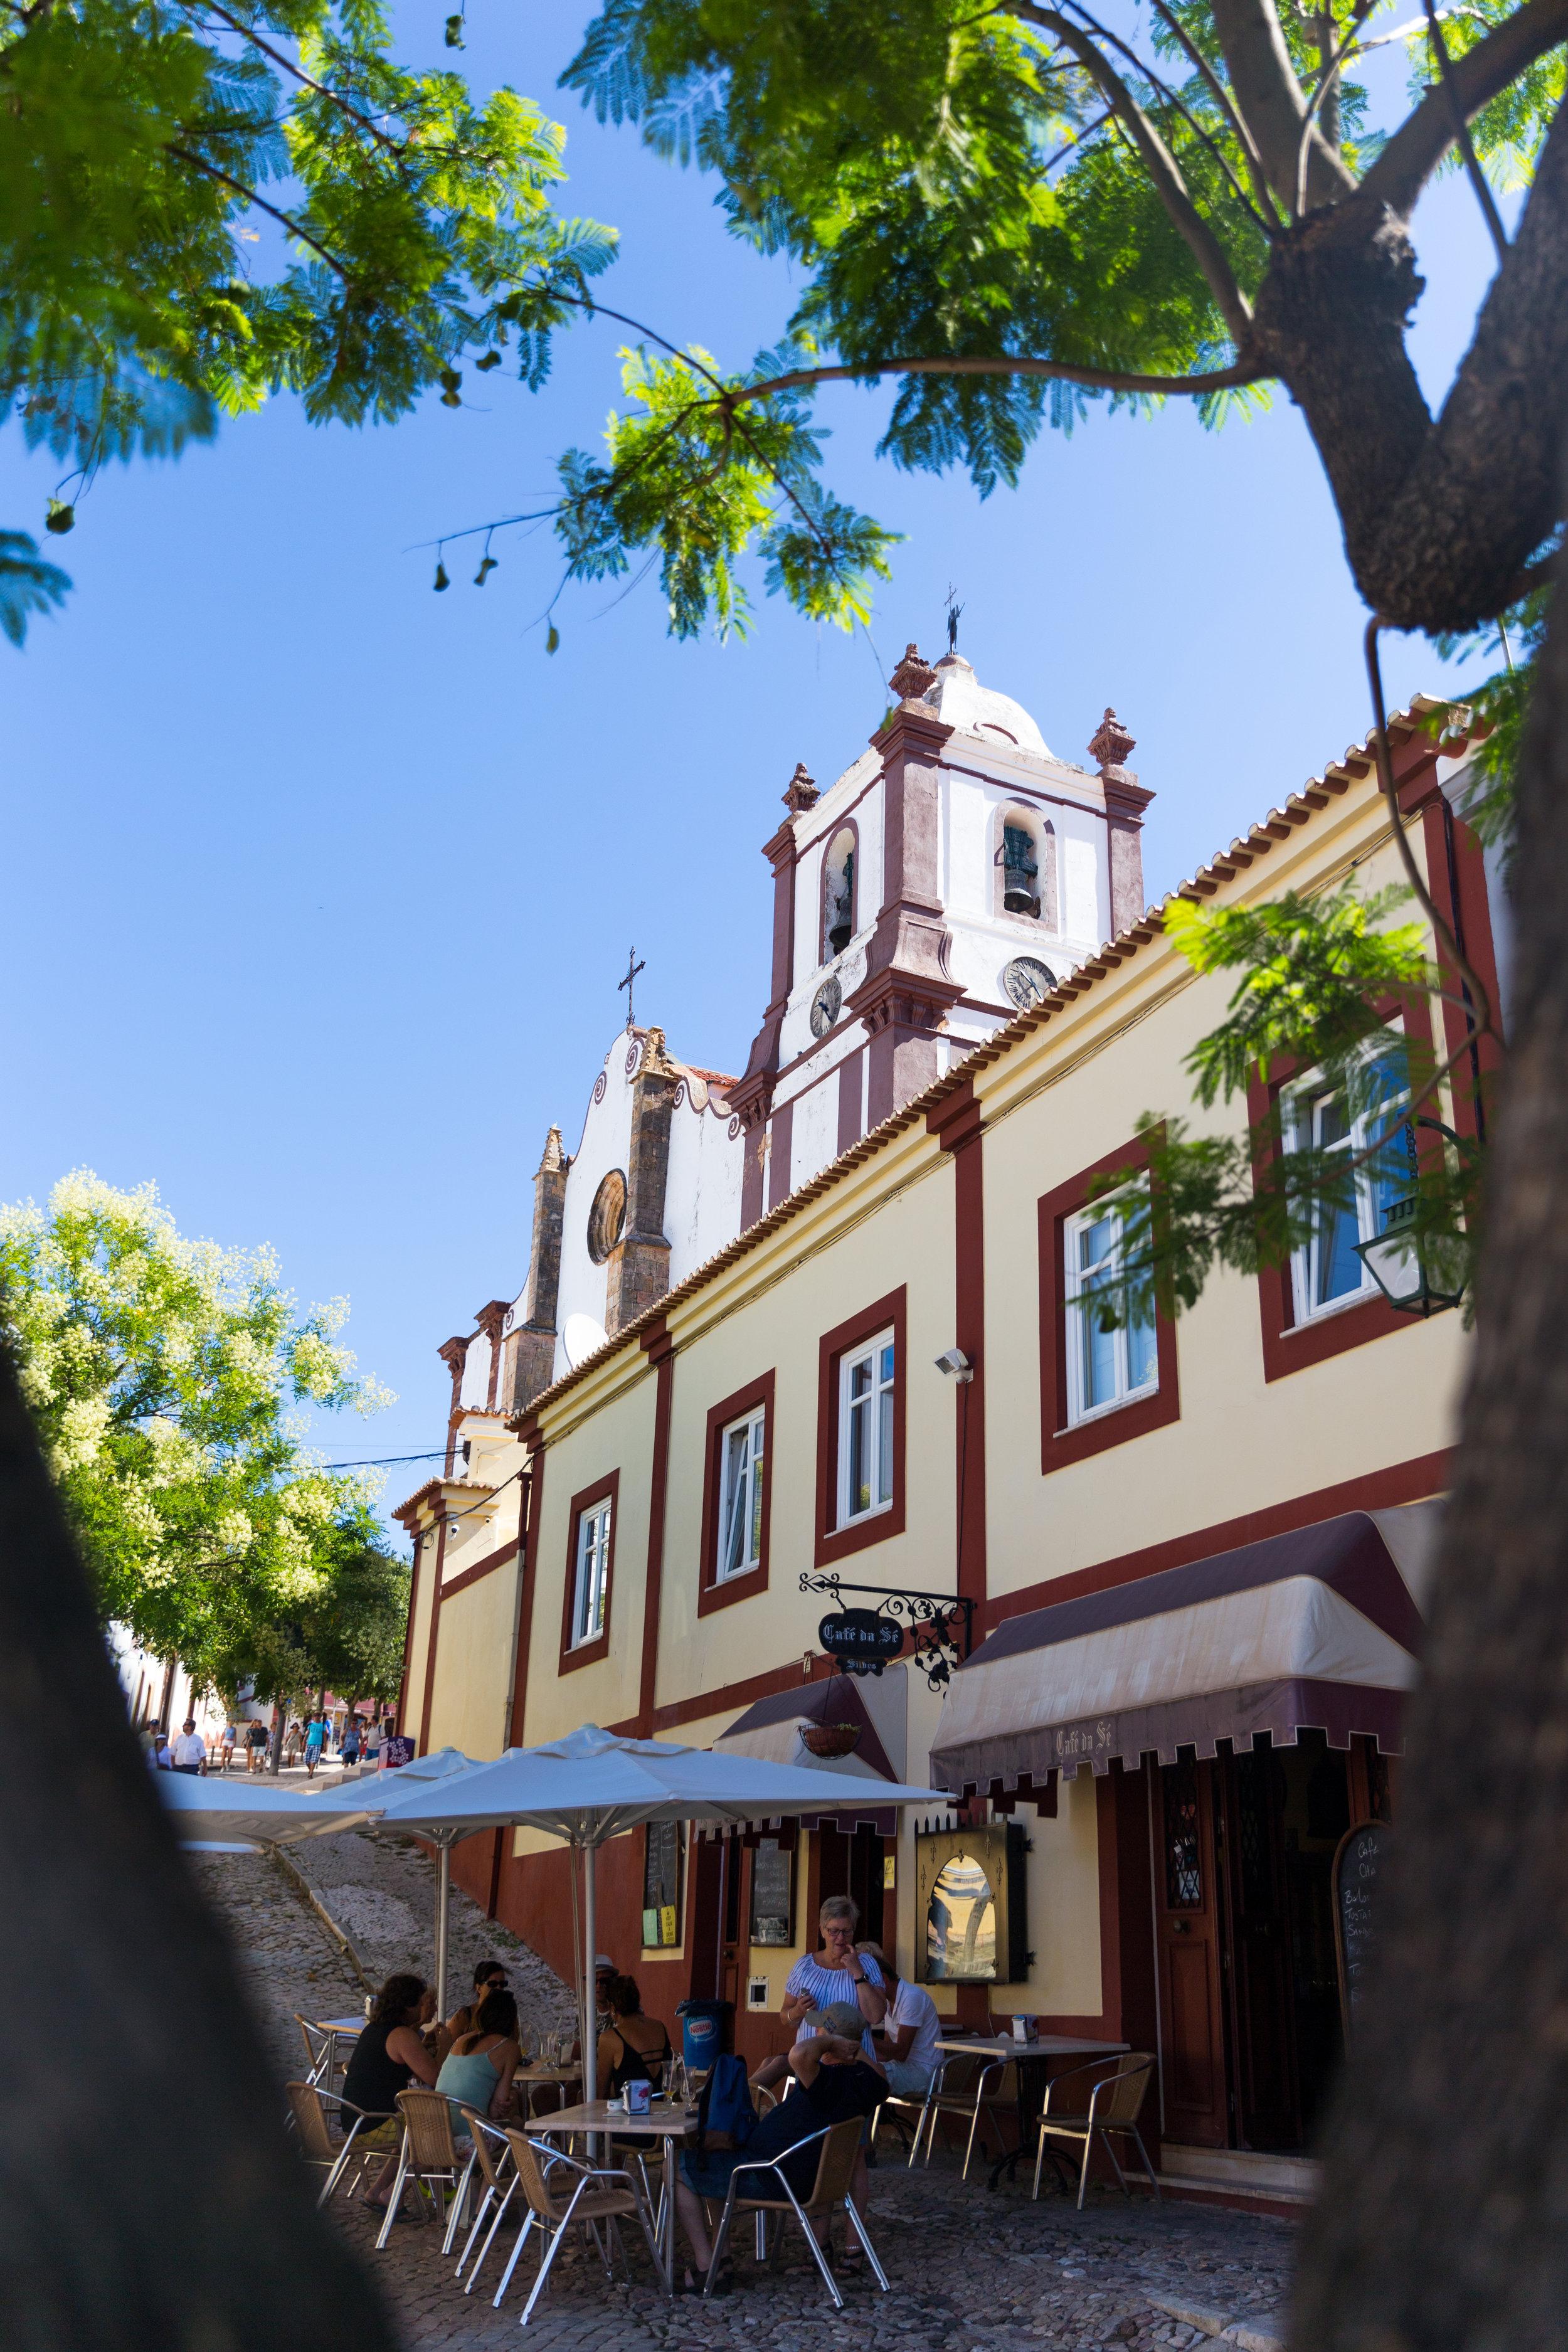 Portugal Algarve Summer Travel-5.jpg